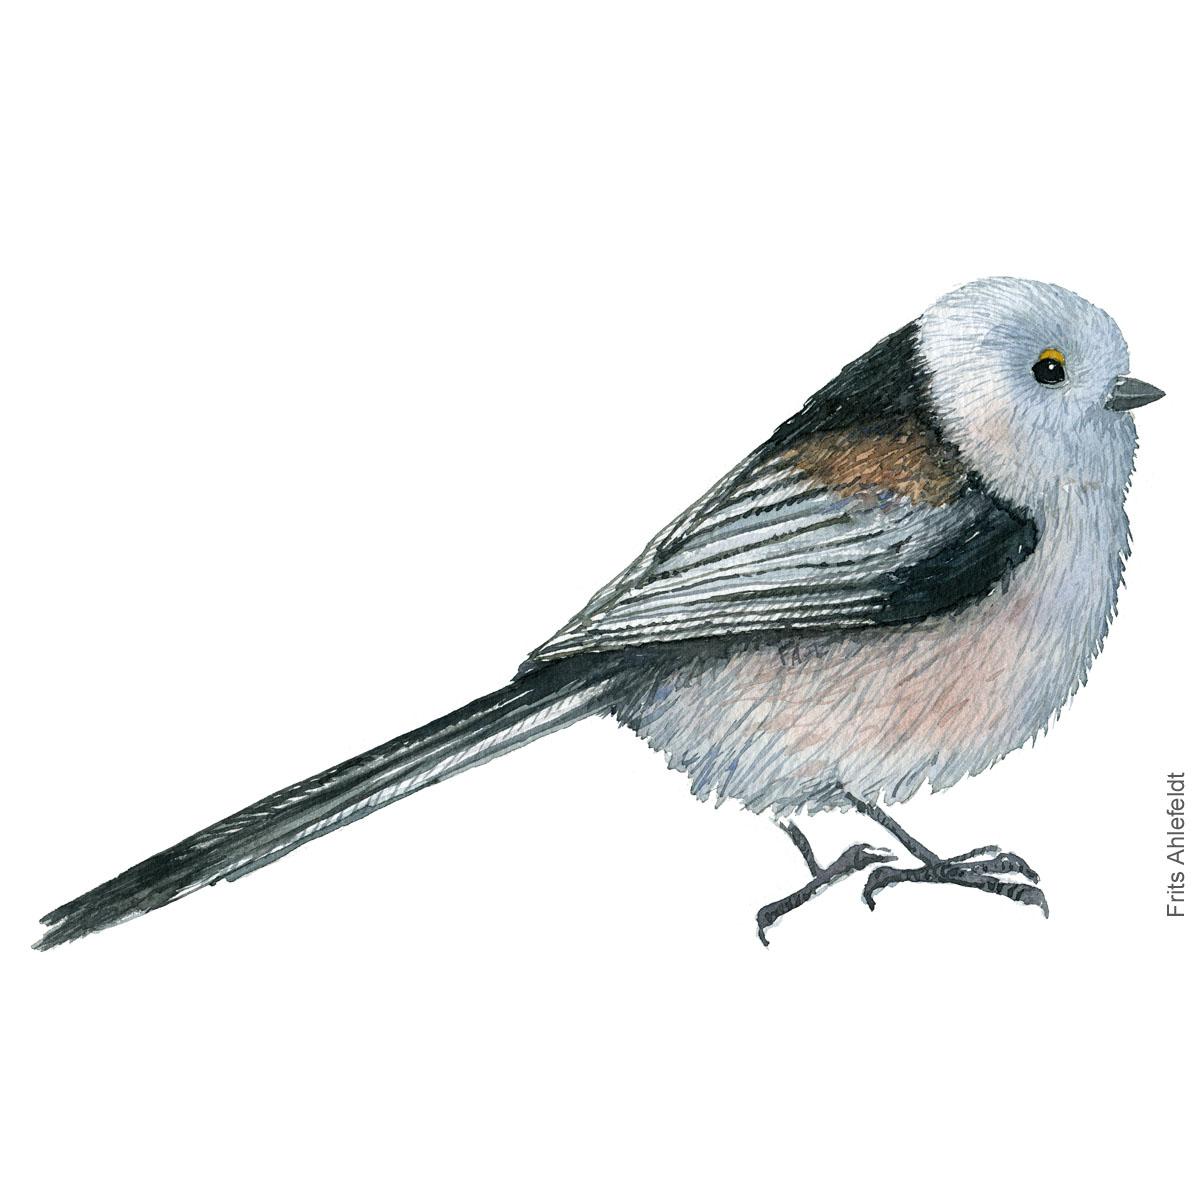 Halemejse - Long tailed tit - Bird watercolor painting. Artwork by Frits Ahlefeldt. Fugle akvarel